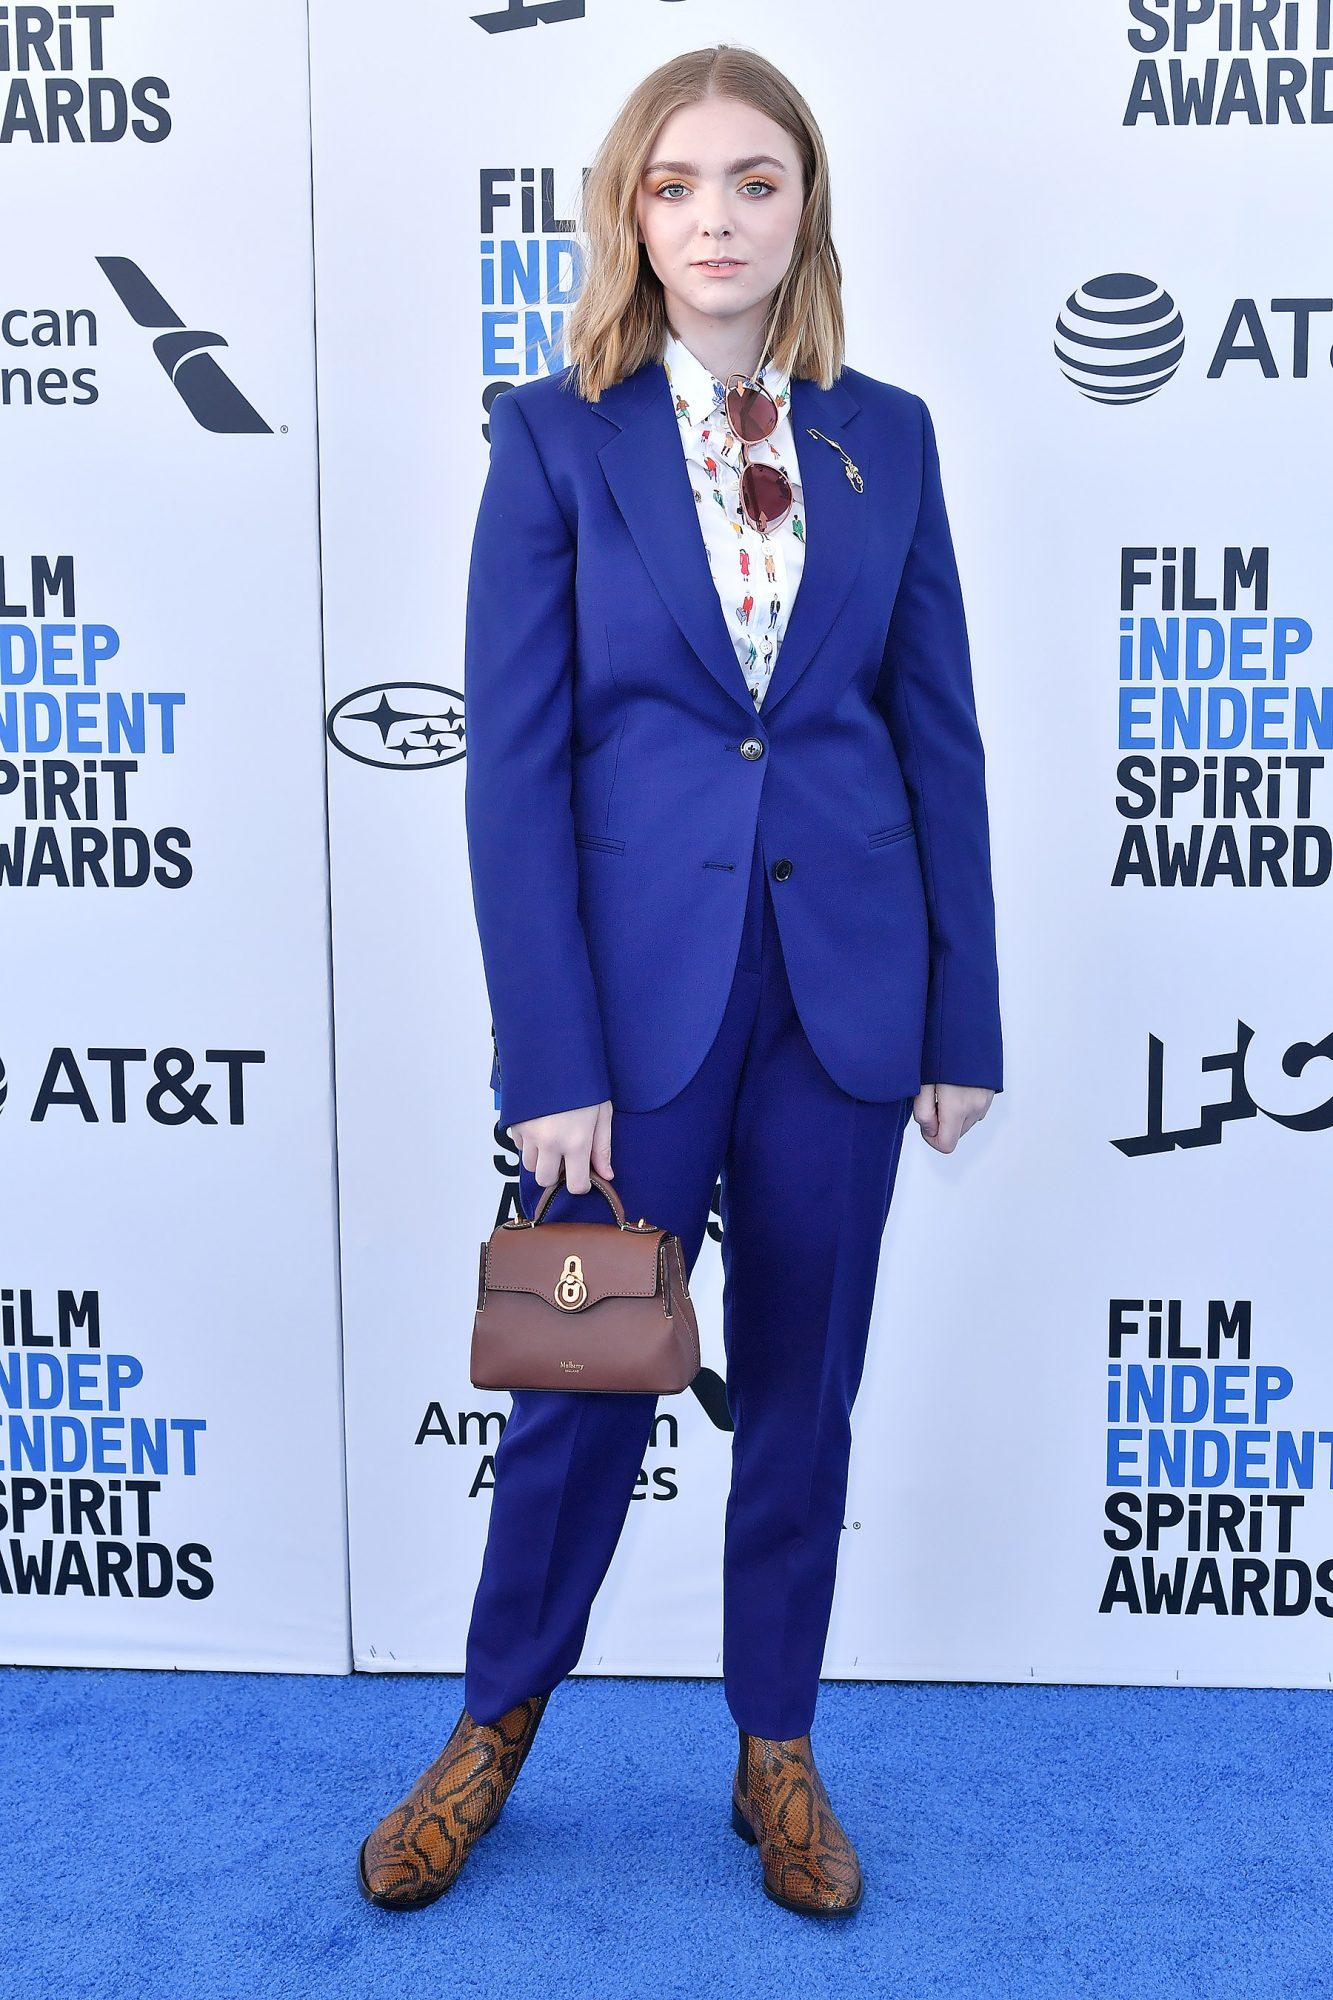 34th Film Independent Spirit Awards, Arrivals, Los Angeles, USA - 23 Feb 2019